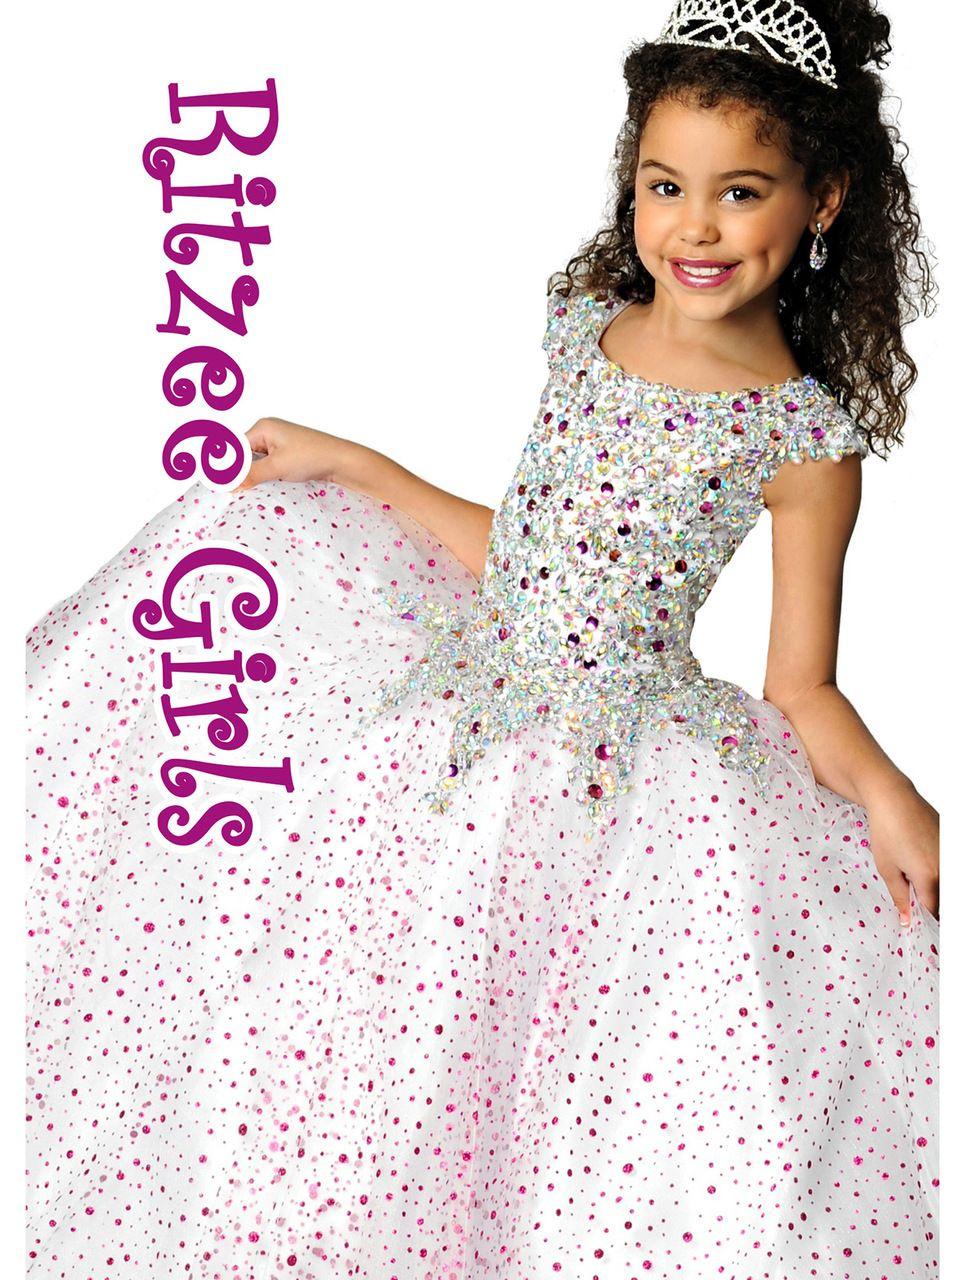 Glitz pageant dresses for rent - Glitz Pageant Gown By Ritzee Girls 6791 Ritzee Pageant Dress For Girls